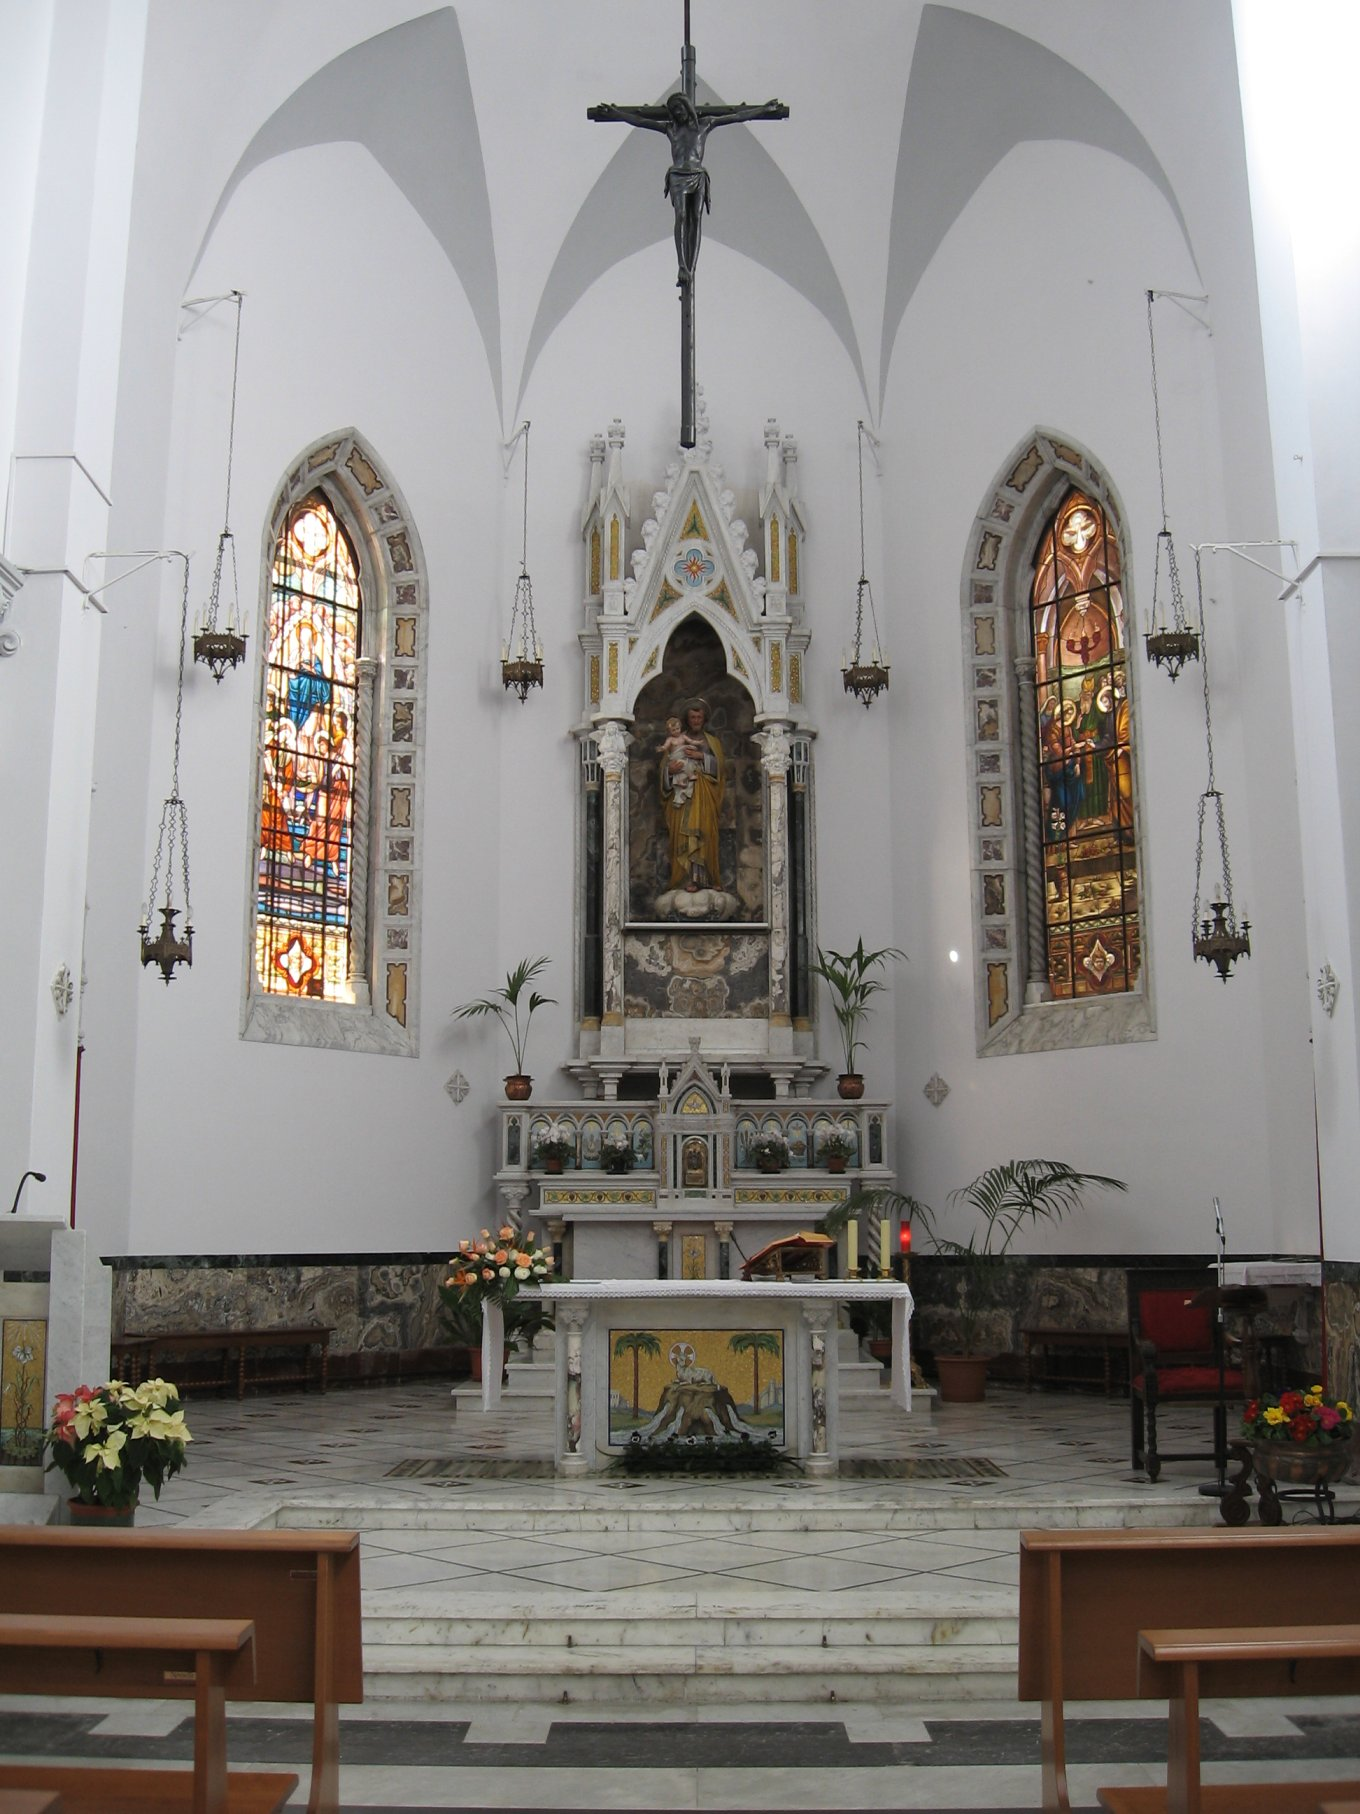 Chiesa_interno-2009-01-27-12.58.14.jpg